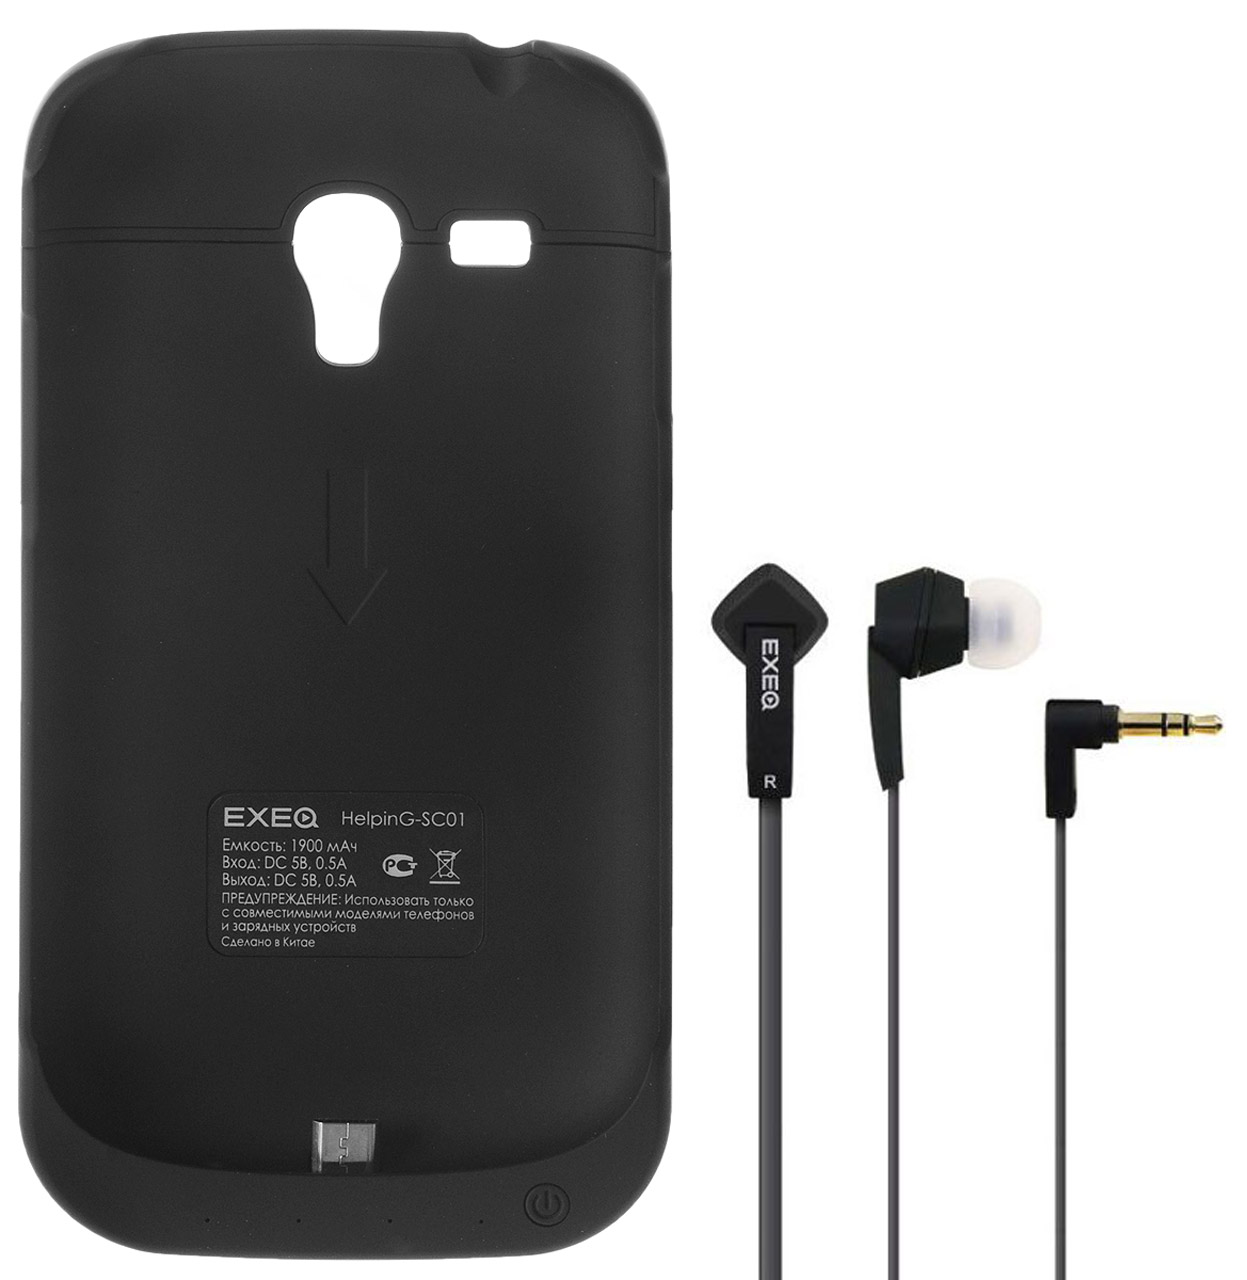 EXEQ HelpinG-SC01 чехол-аккумулятор для Samsung Galaxy S3 mini, Black (1900 мАч, клип-кейс) чехол аккумулятор helping ic01 черный 1900 мач